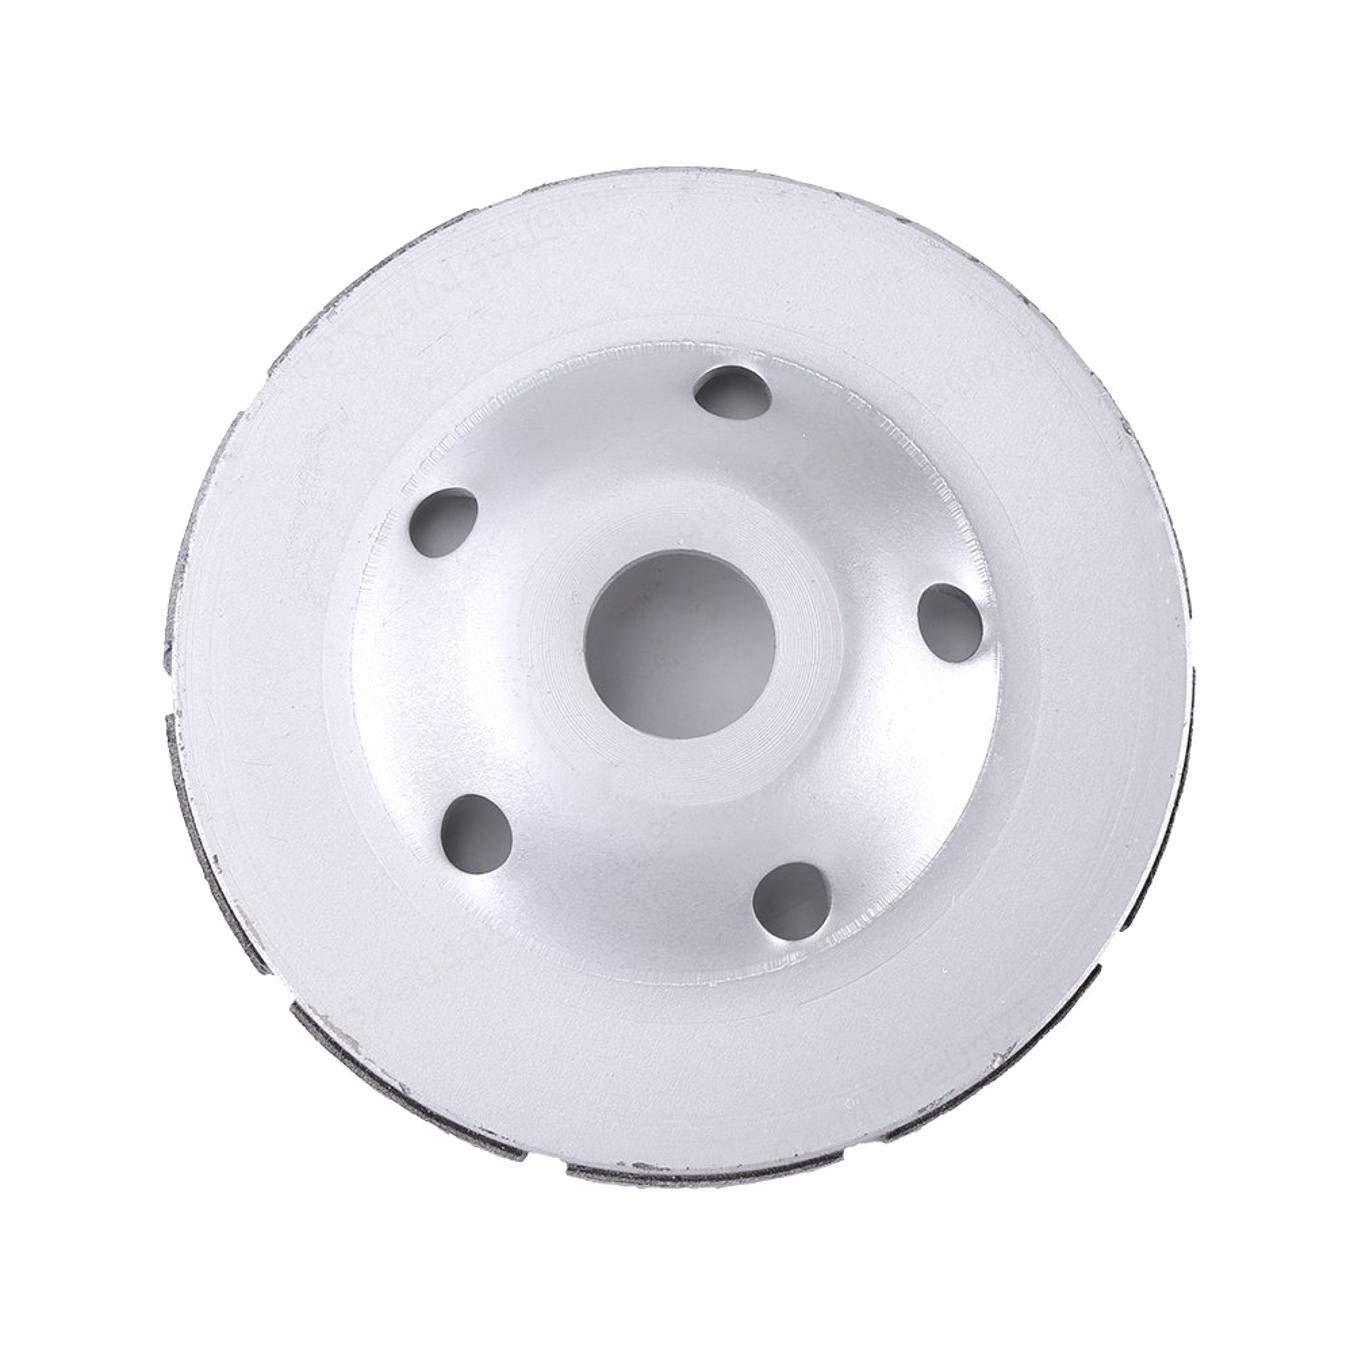 Asfalto de Pulido de cer/ámica PRINDIY Disco de Pulido de Diamante Rueda de Copa de Doble Fila 125 mm 5 Pulgadas para Amoladora Angular Amolado de Piedra